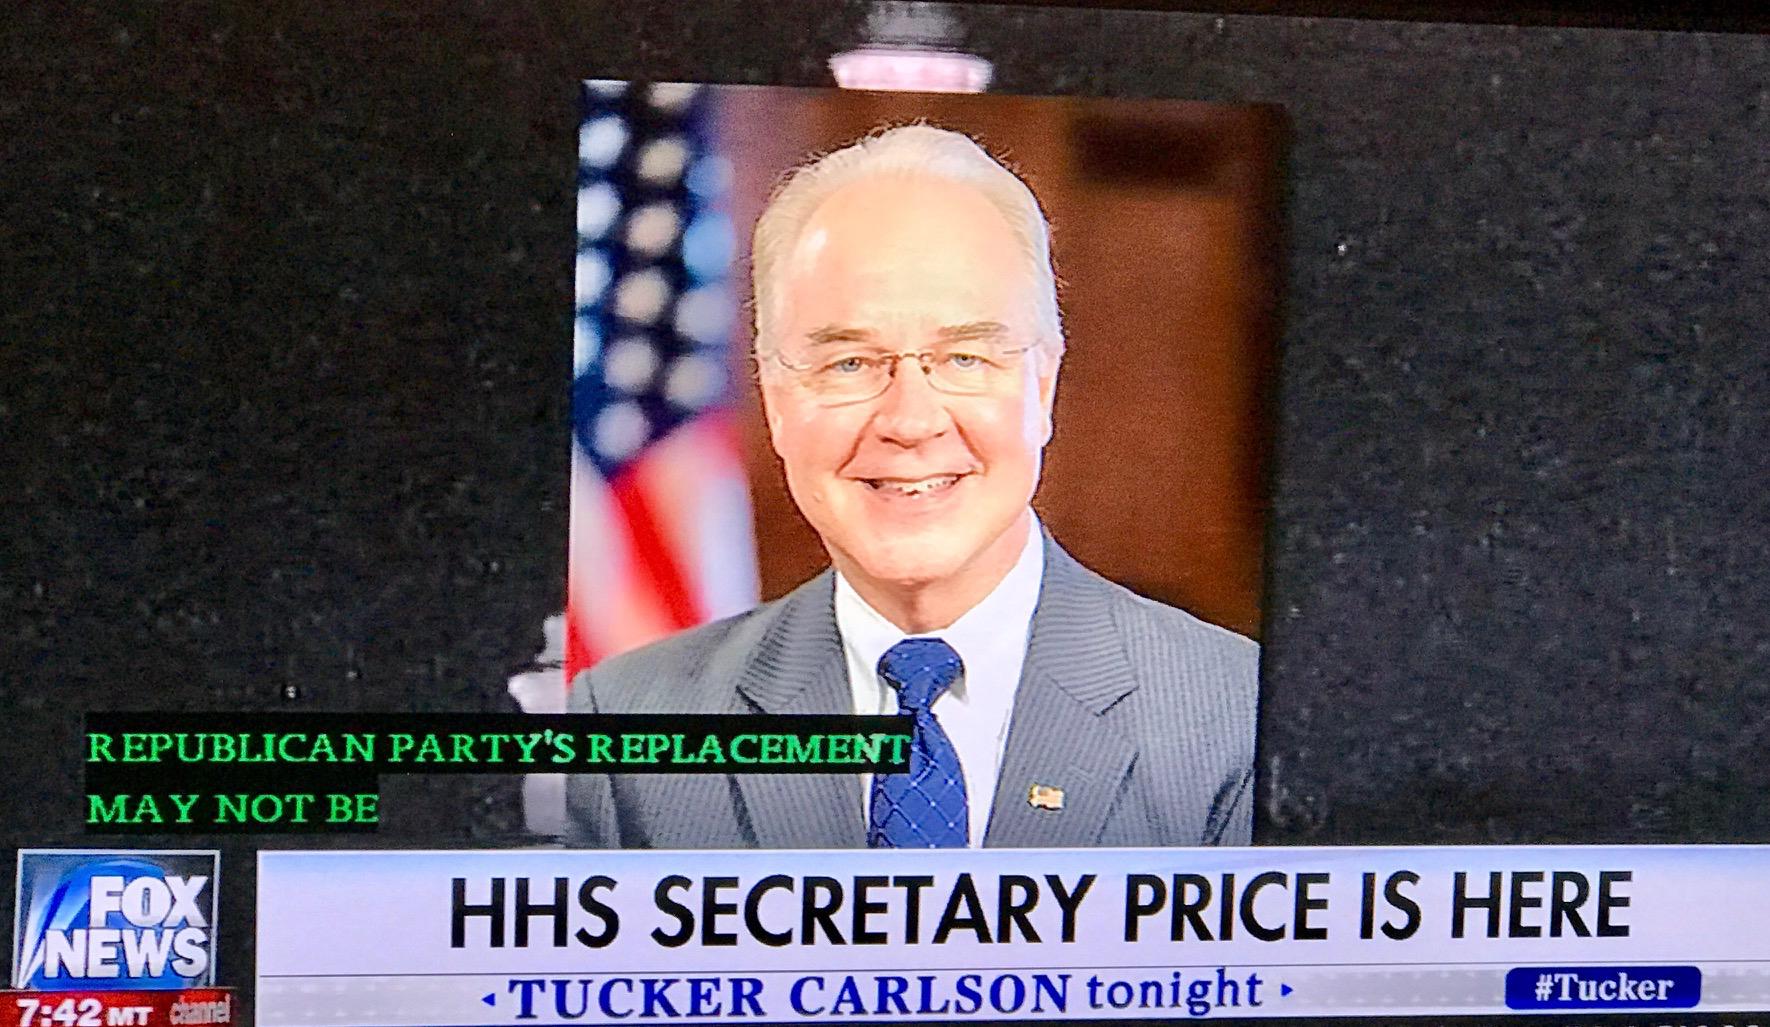 Tom Price, Secretary of HHS